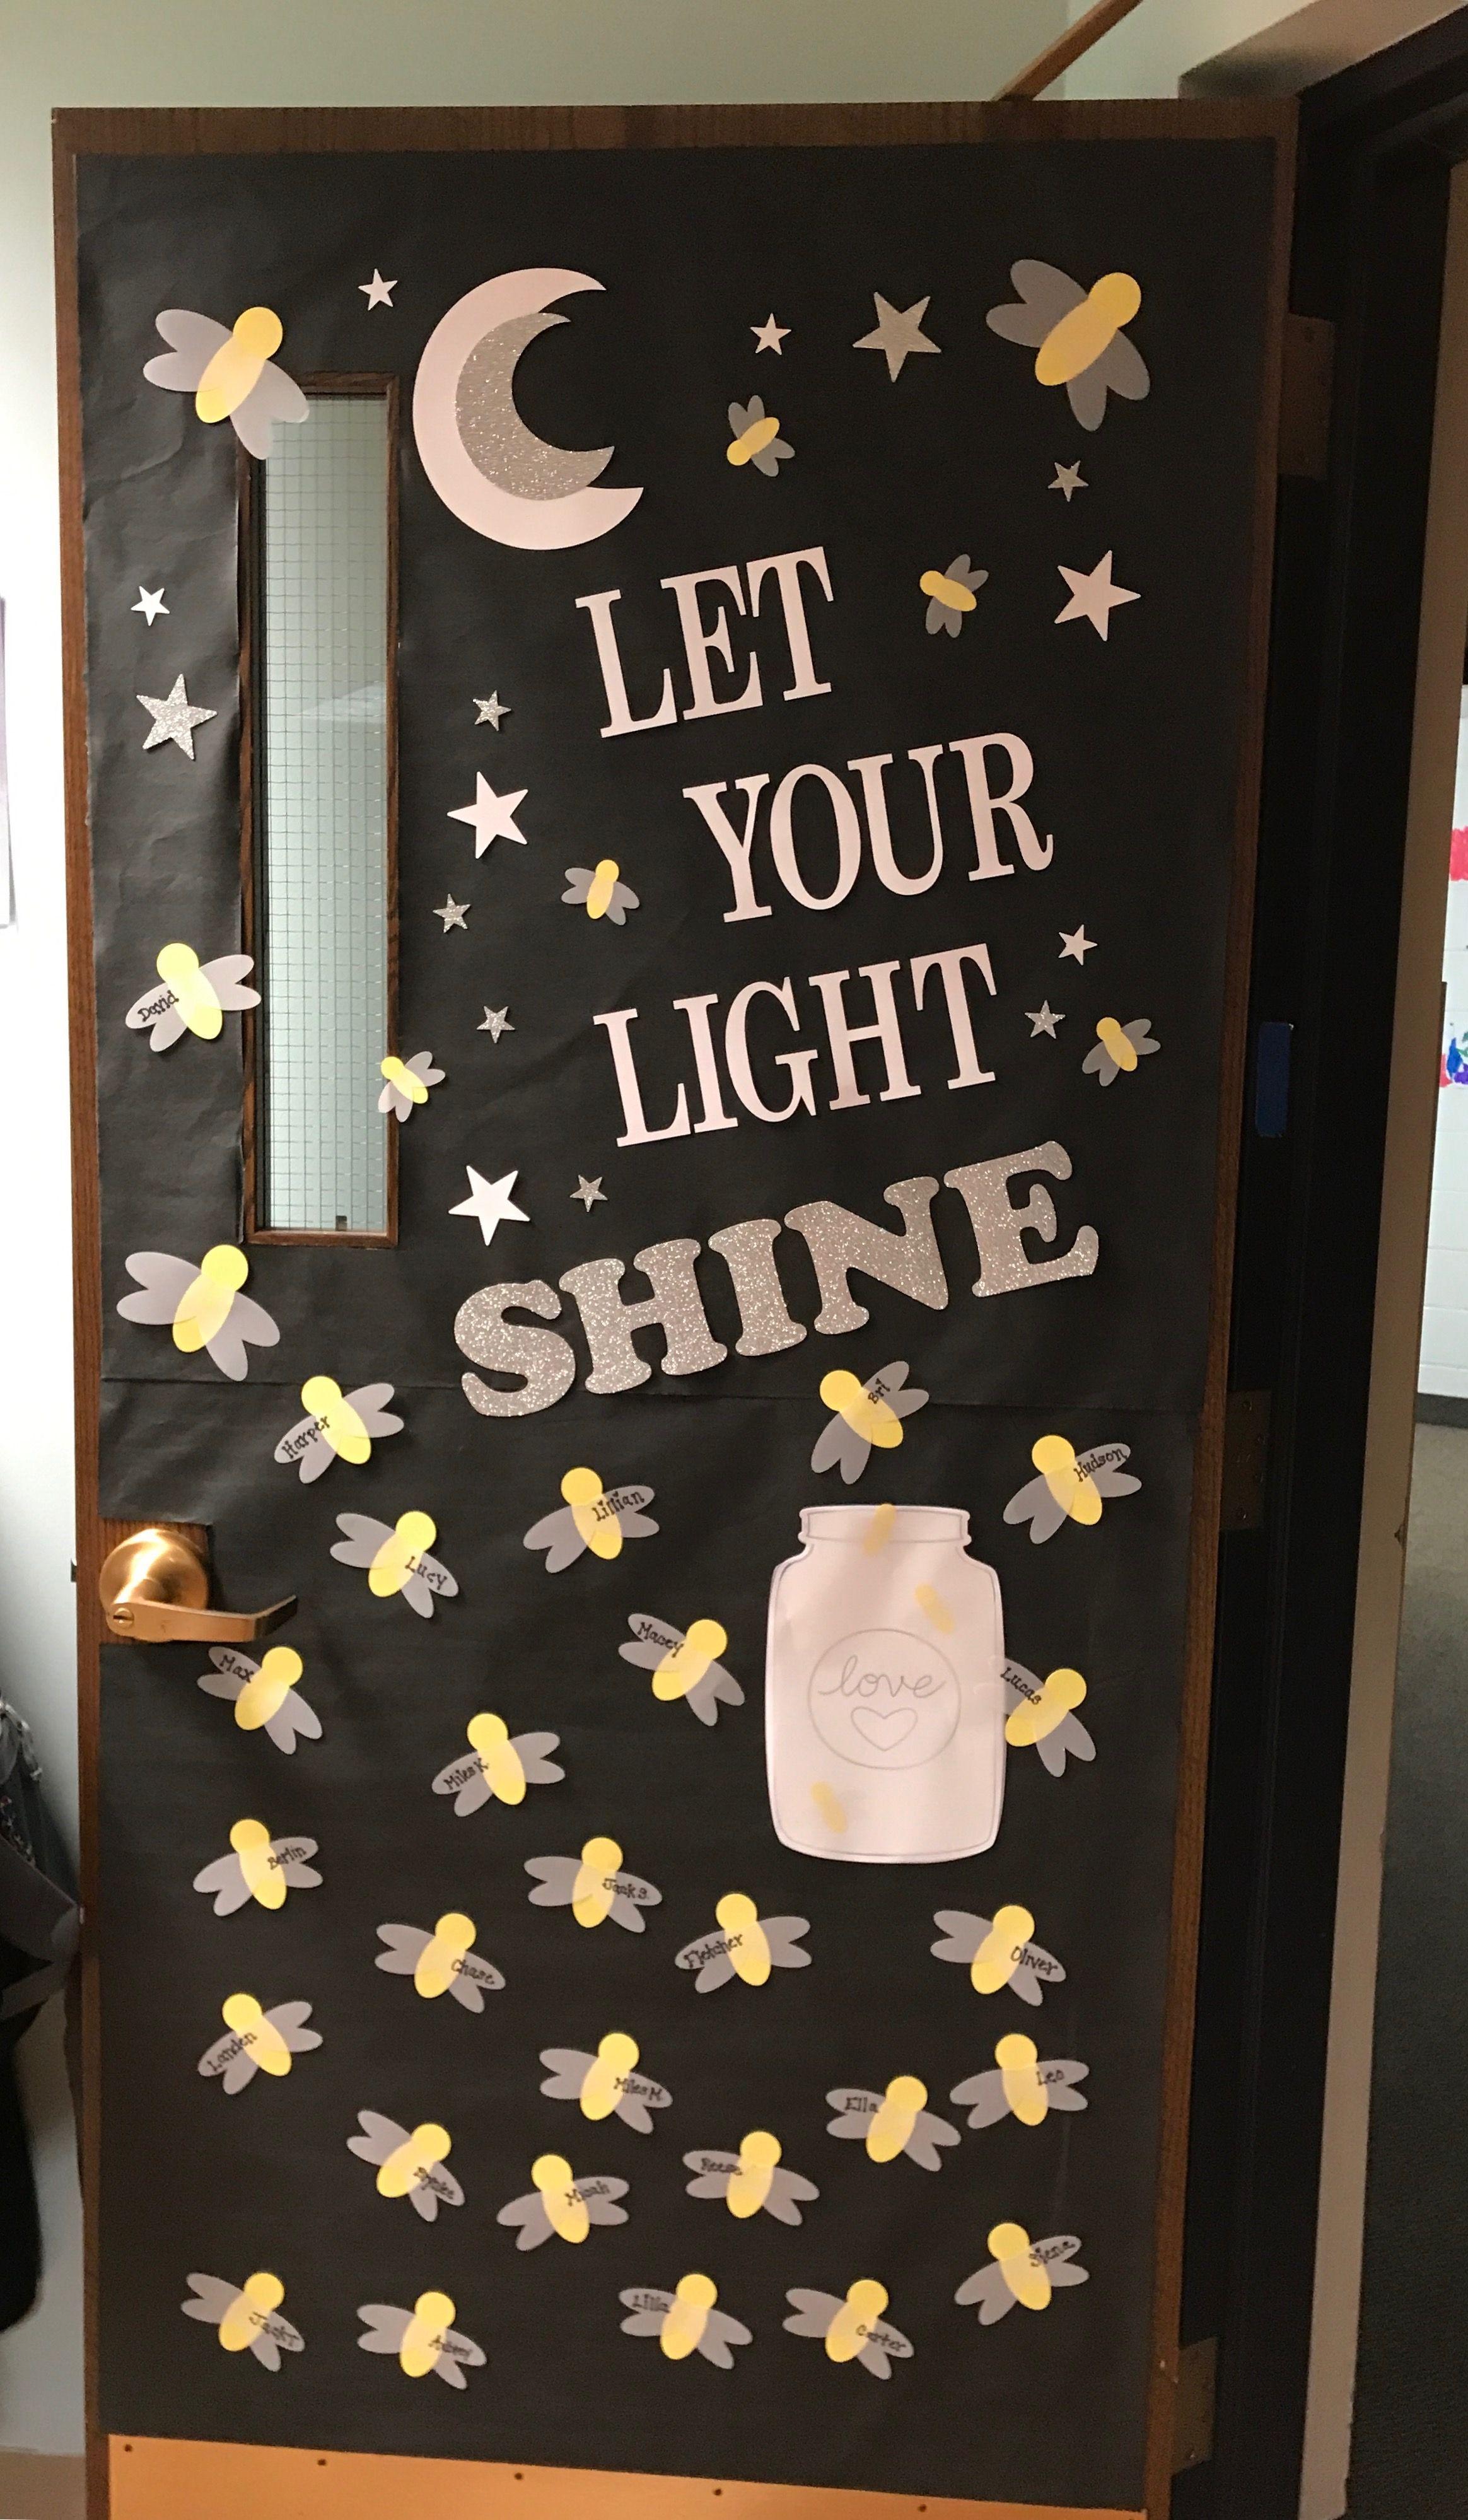 Firefly Let Your Light Shine School Door Decorations Sunday School Classroom Camping Theme Classroom